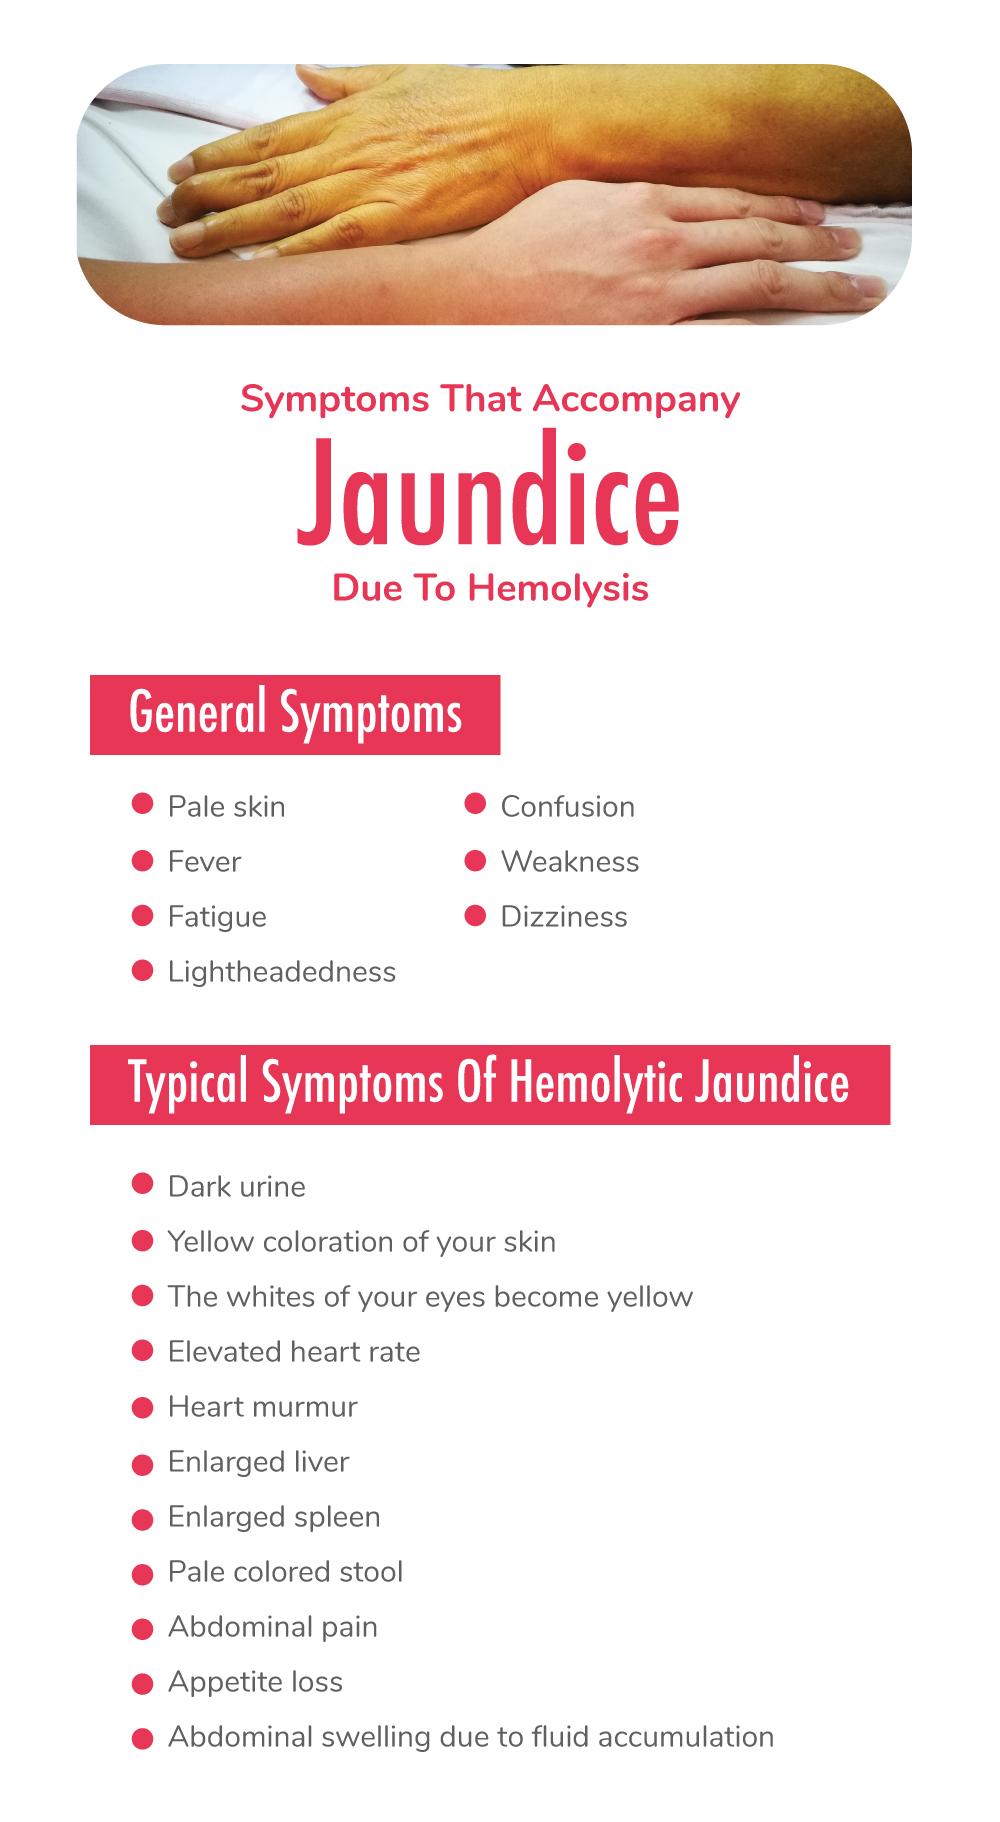 Symptoms That Accompany Jaundice Due To Hemolysis